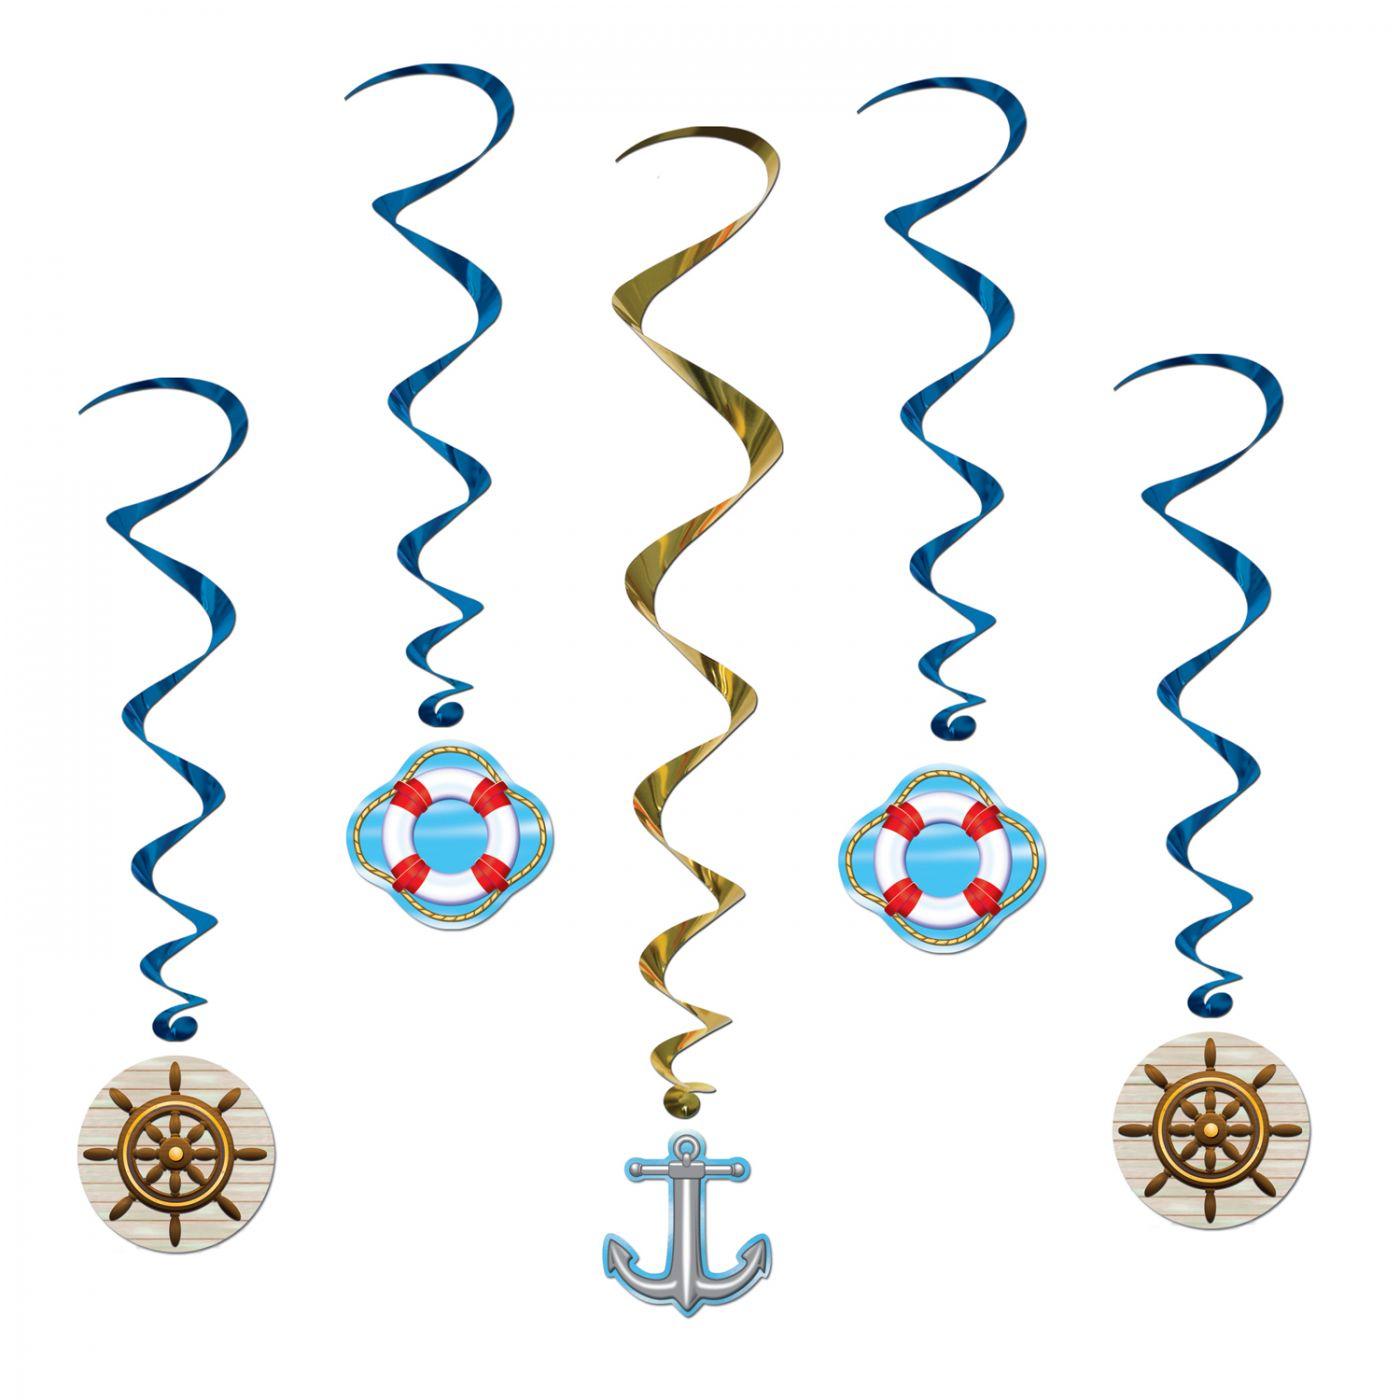 Cruise Ship Whirls (6) image